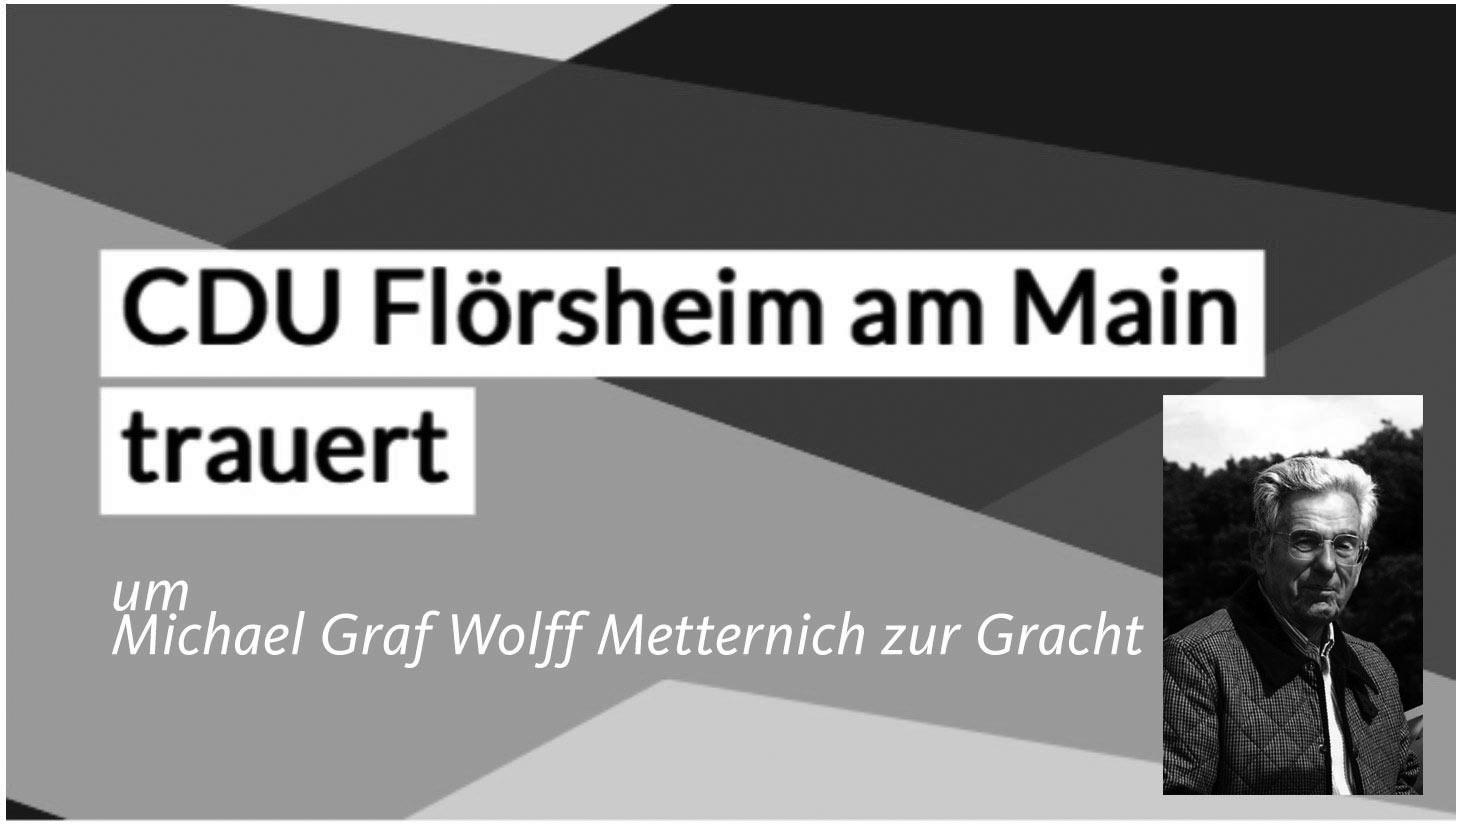 Flörsheimer CDU trauert um Michael Graf Wolff Metternich zur Gracht